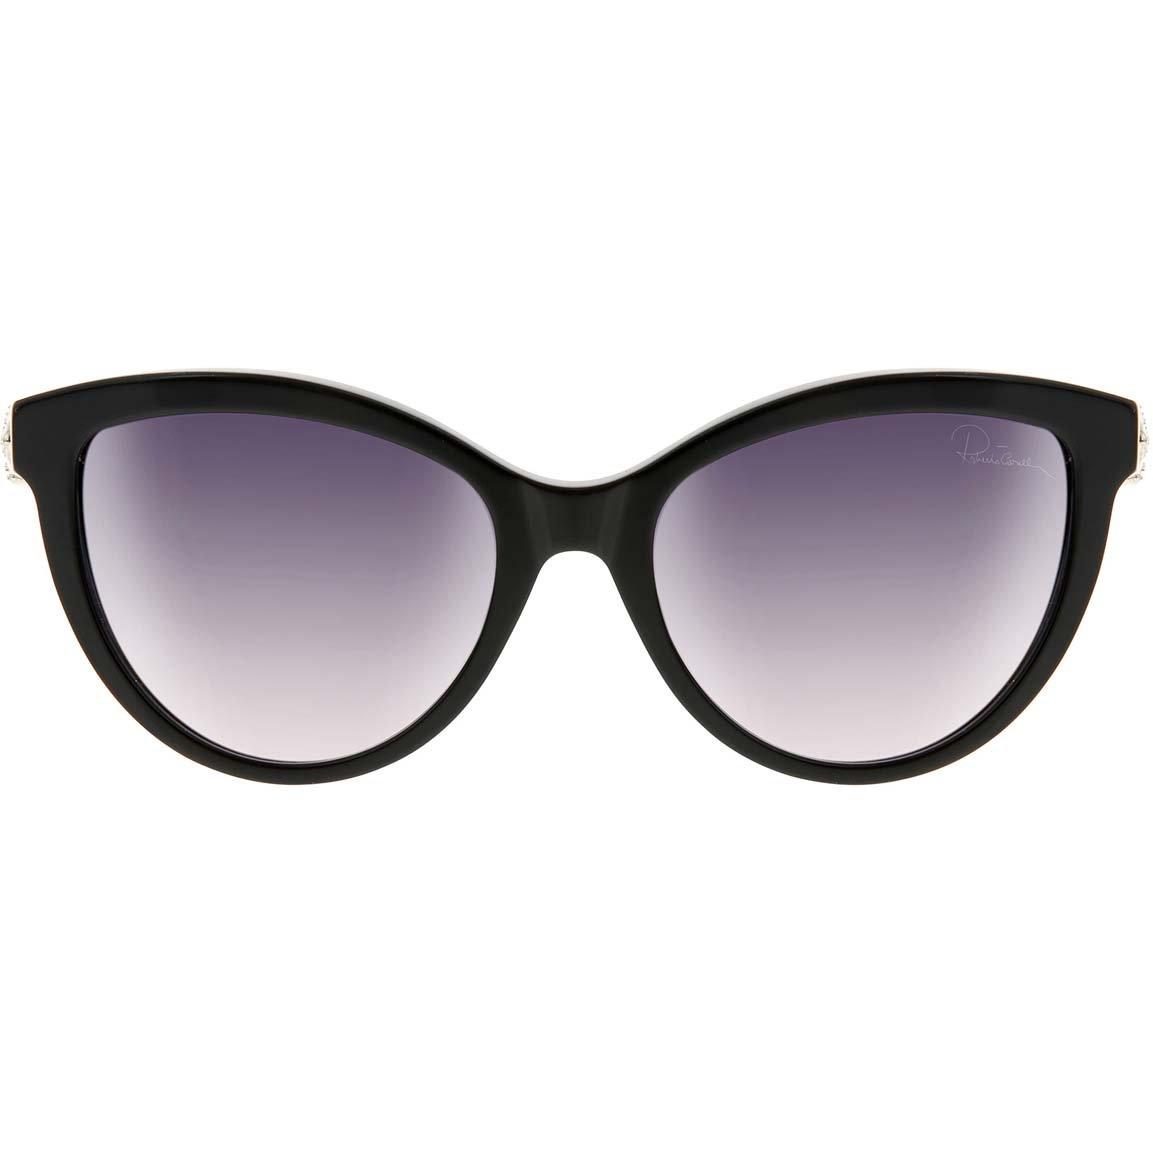 Roberto Cavalli anteojos de anteojos sol rc878s de 01B Negro mm ...